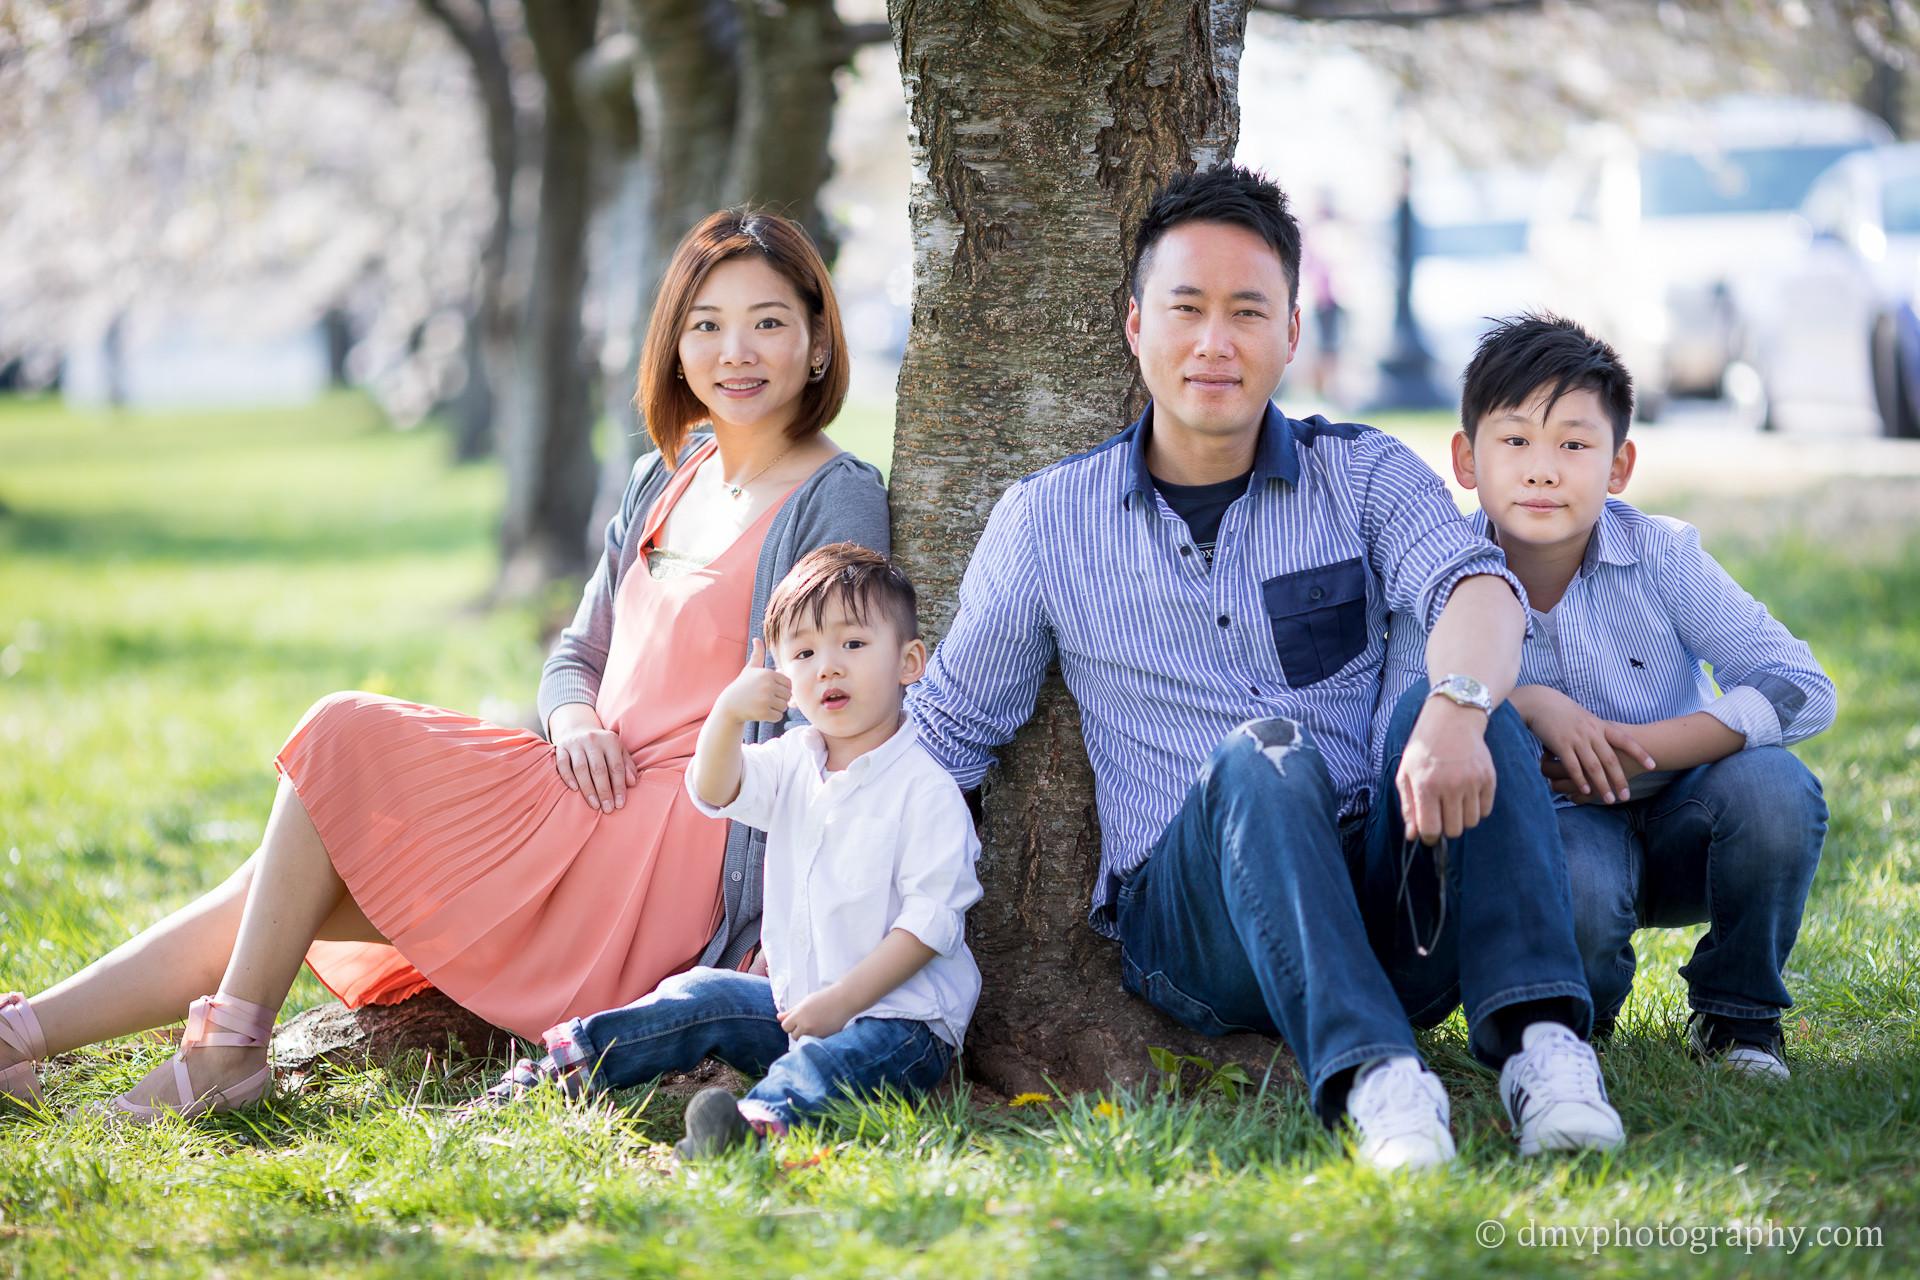 2018-04-17 - Alice Wang Family Cherry Bl